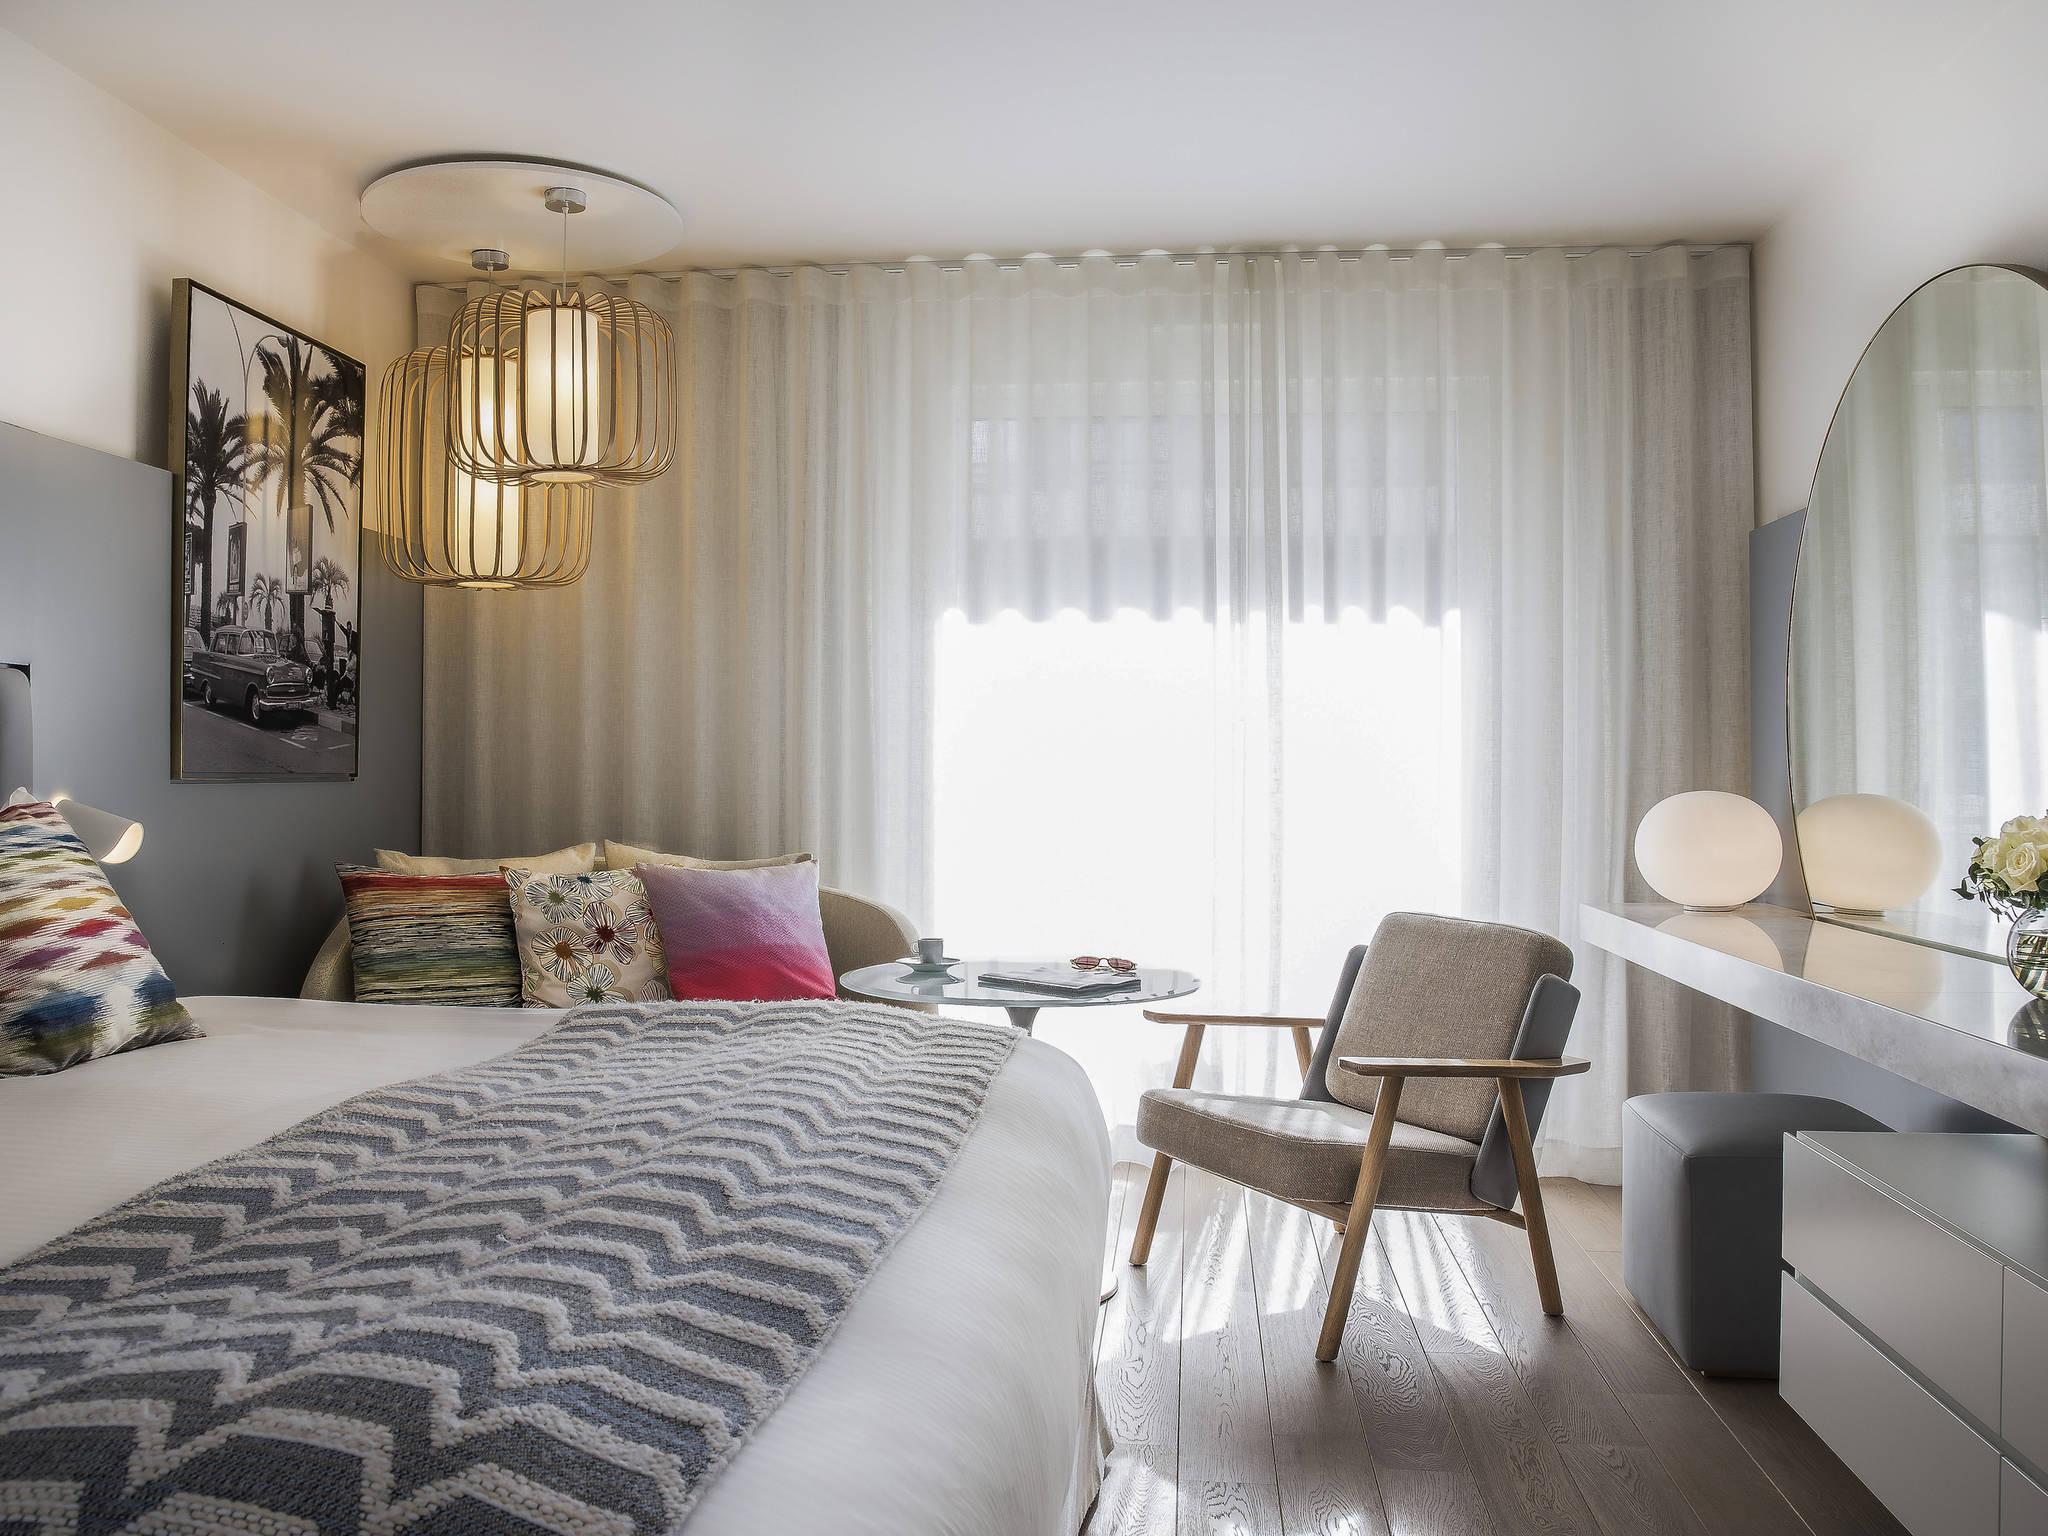 Mercure Croisette Beach Hotel Cannes